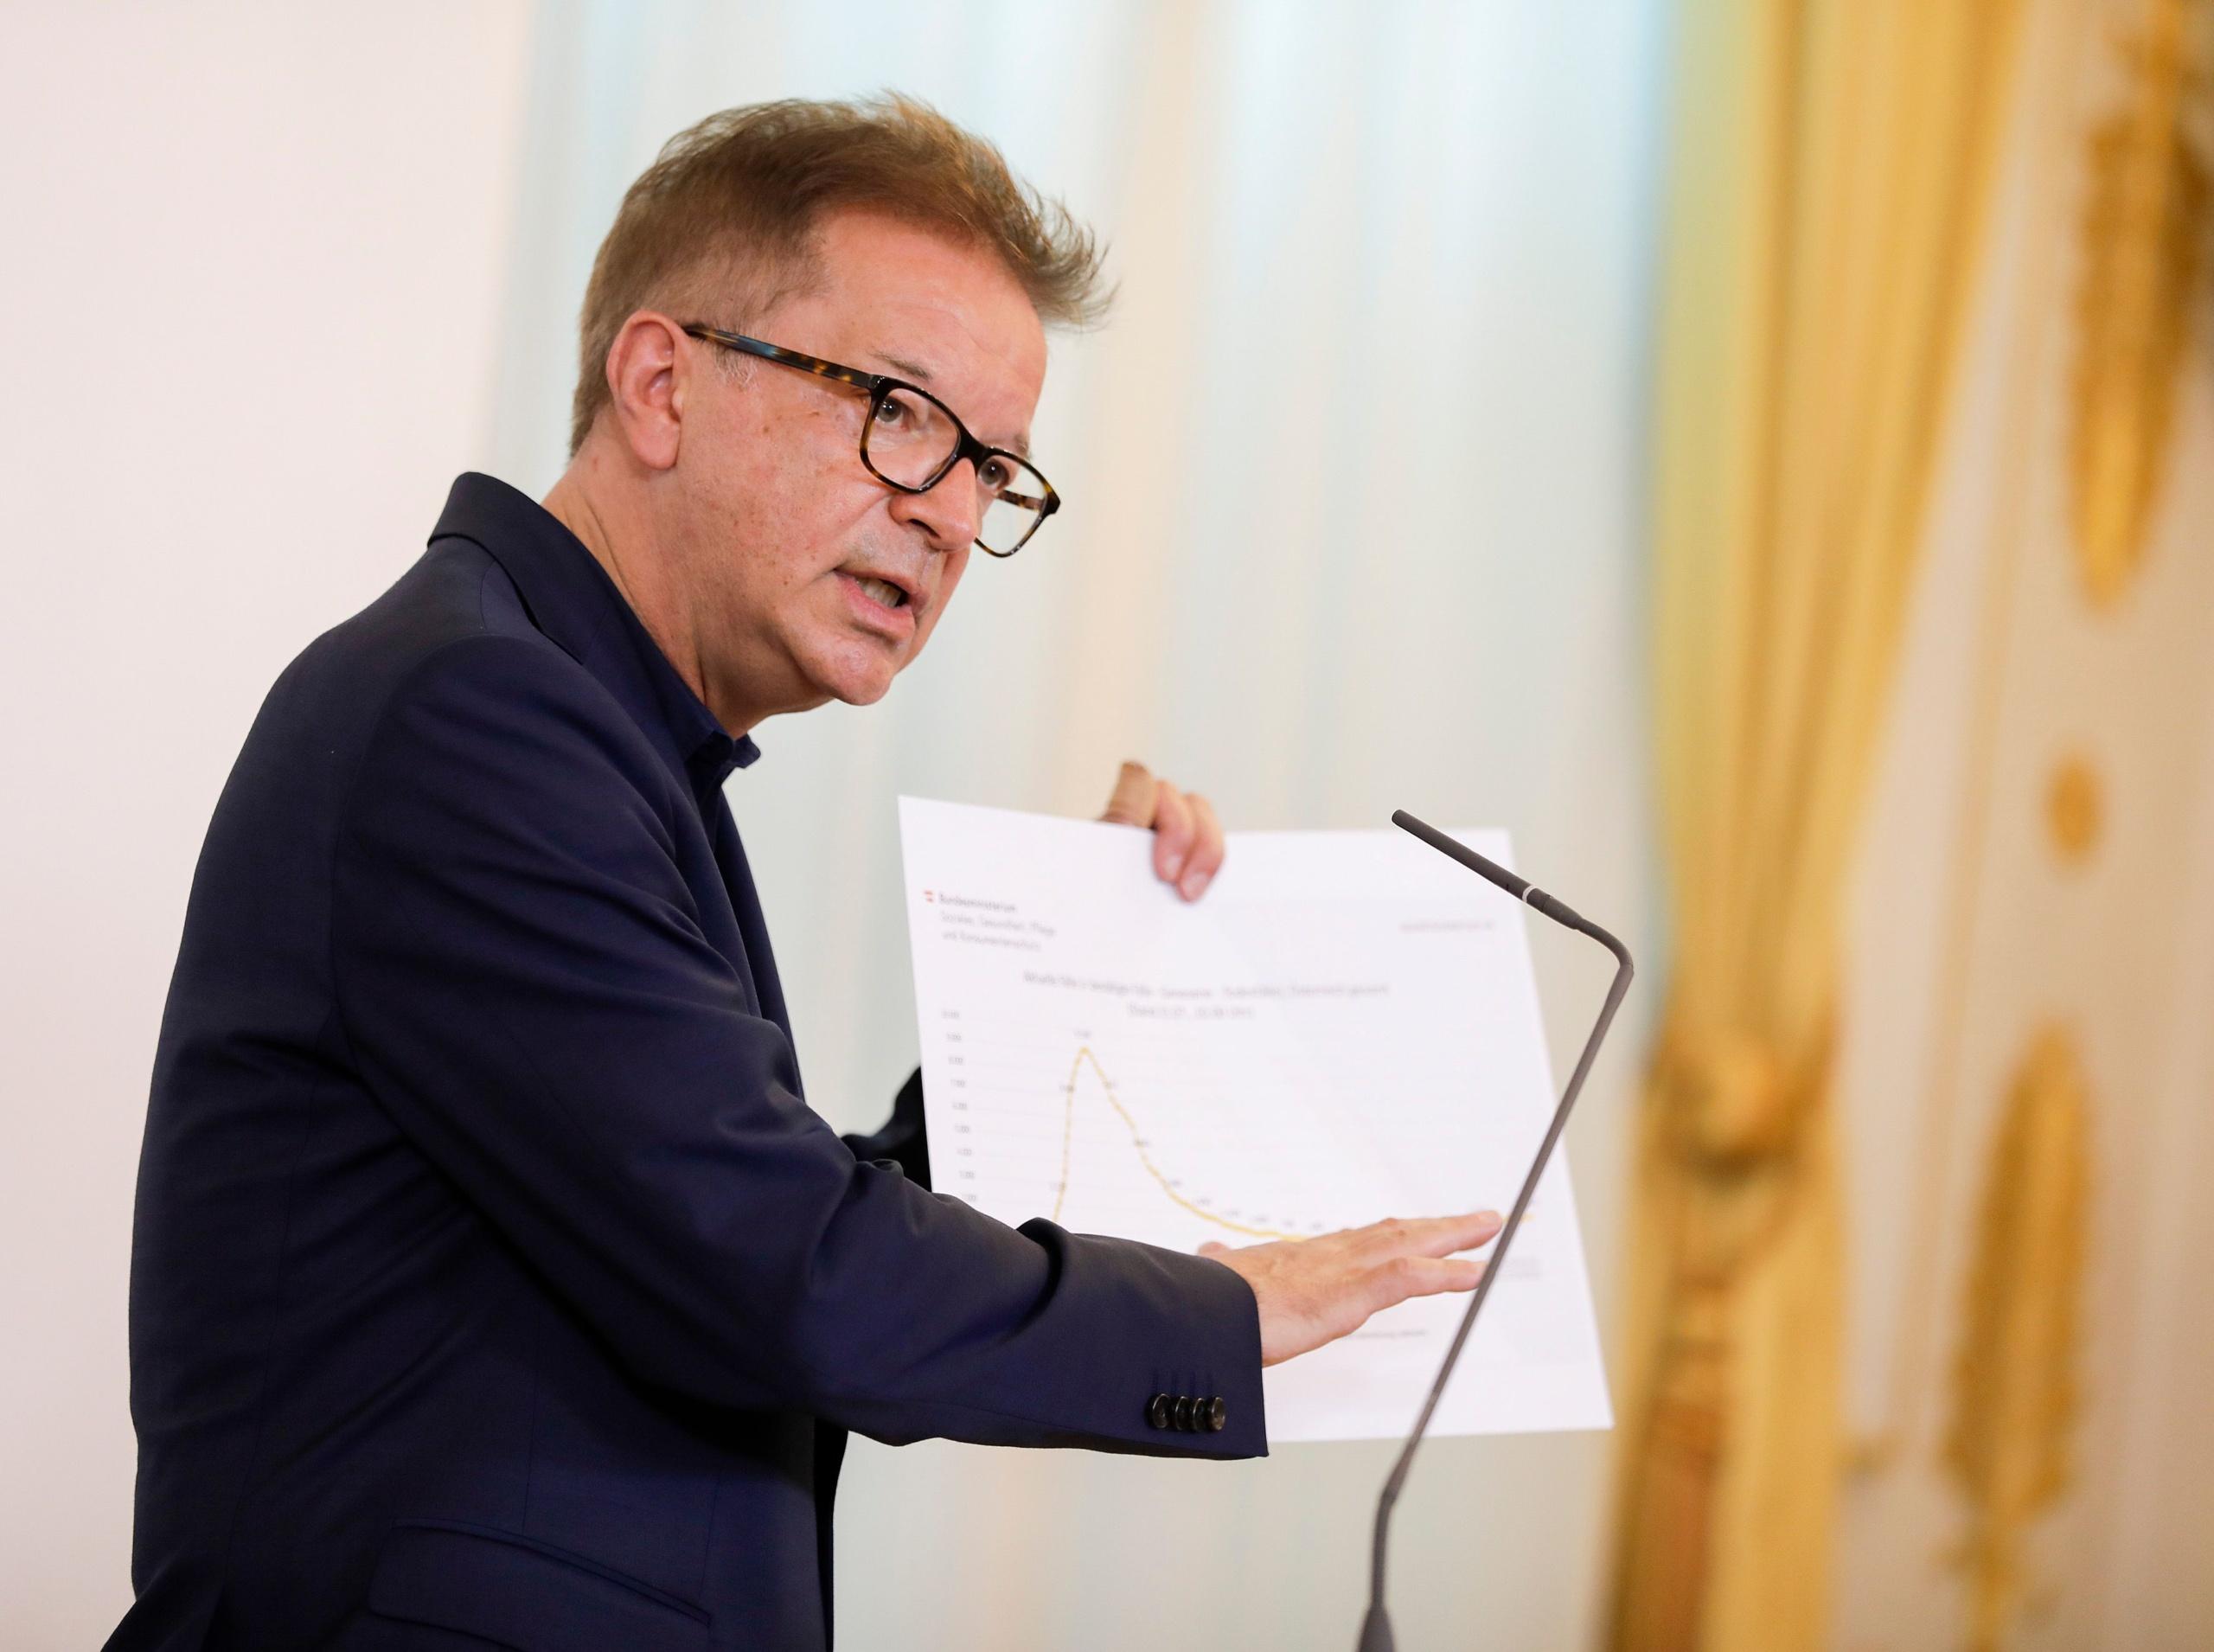 AUSTRIJSKI MINISTAR ZDRAVLJA: Sa 119 novozaraženih ponovno smo troznamenkasti. Isprika za propuste Ministarstva